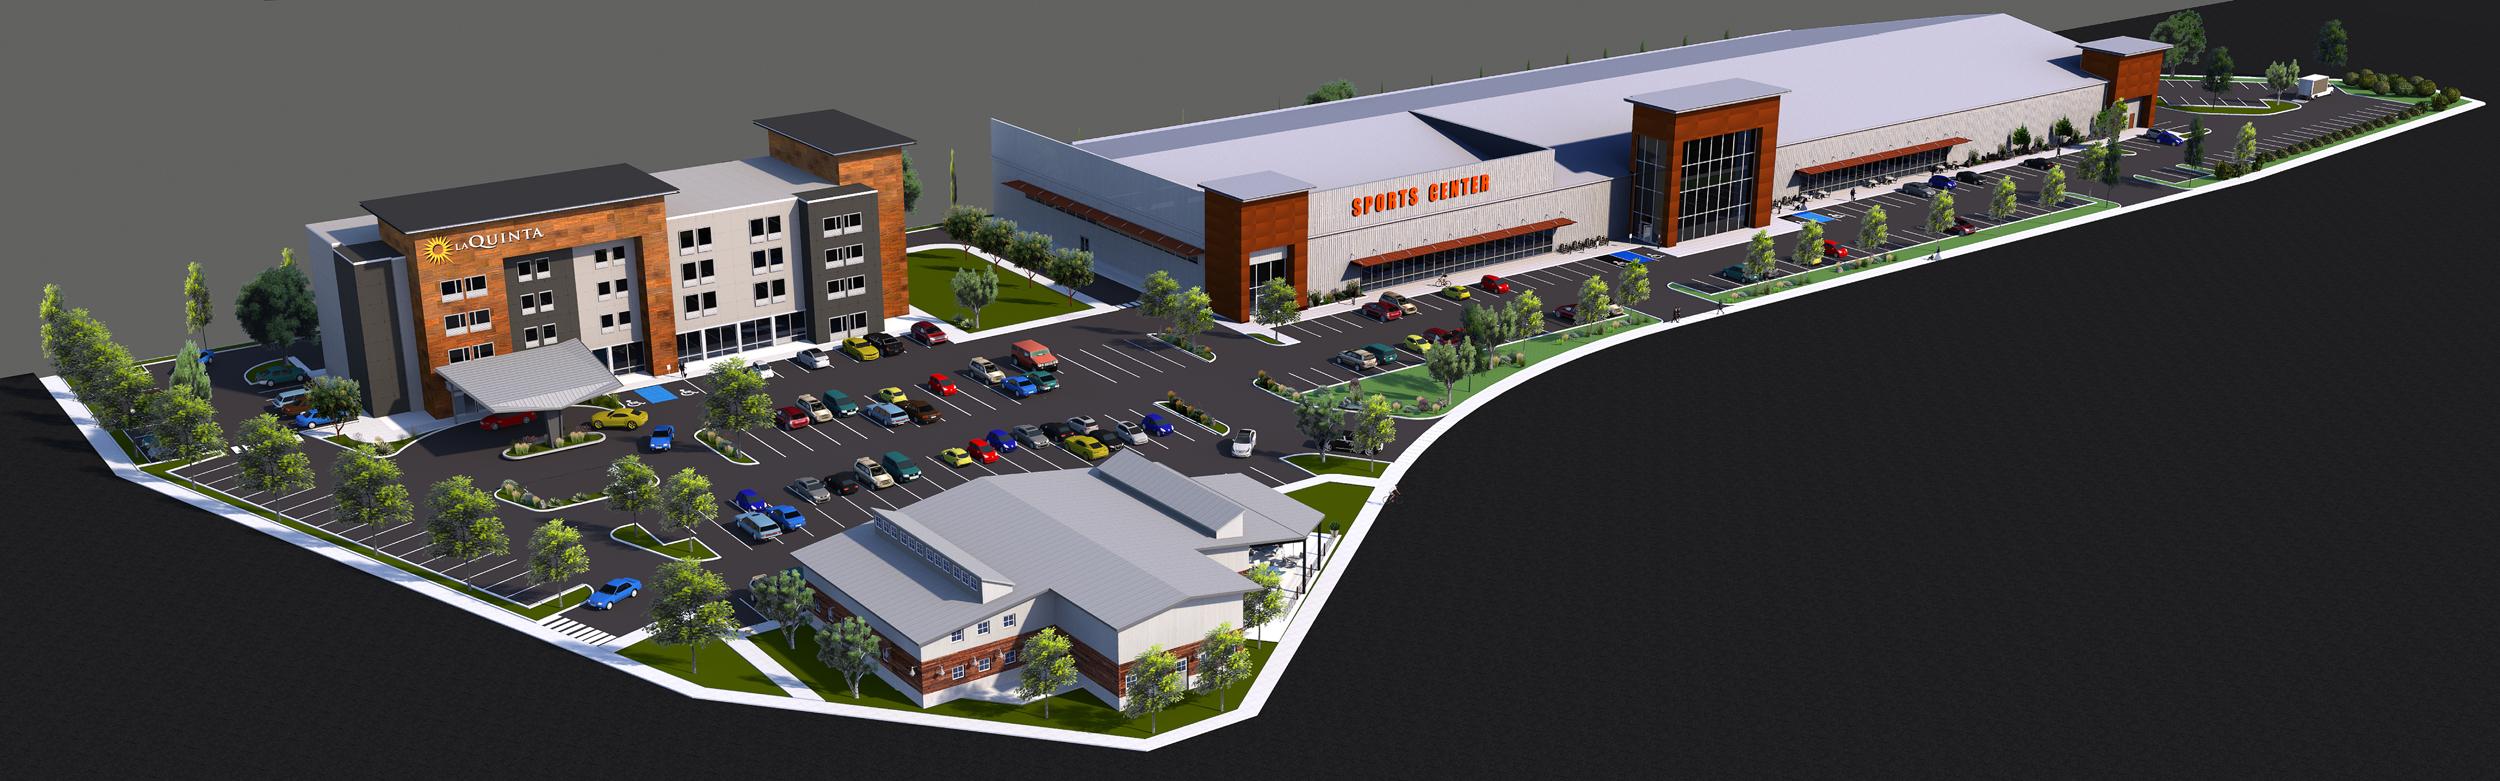 2500 Phoenix Sports Center.jpg